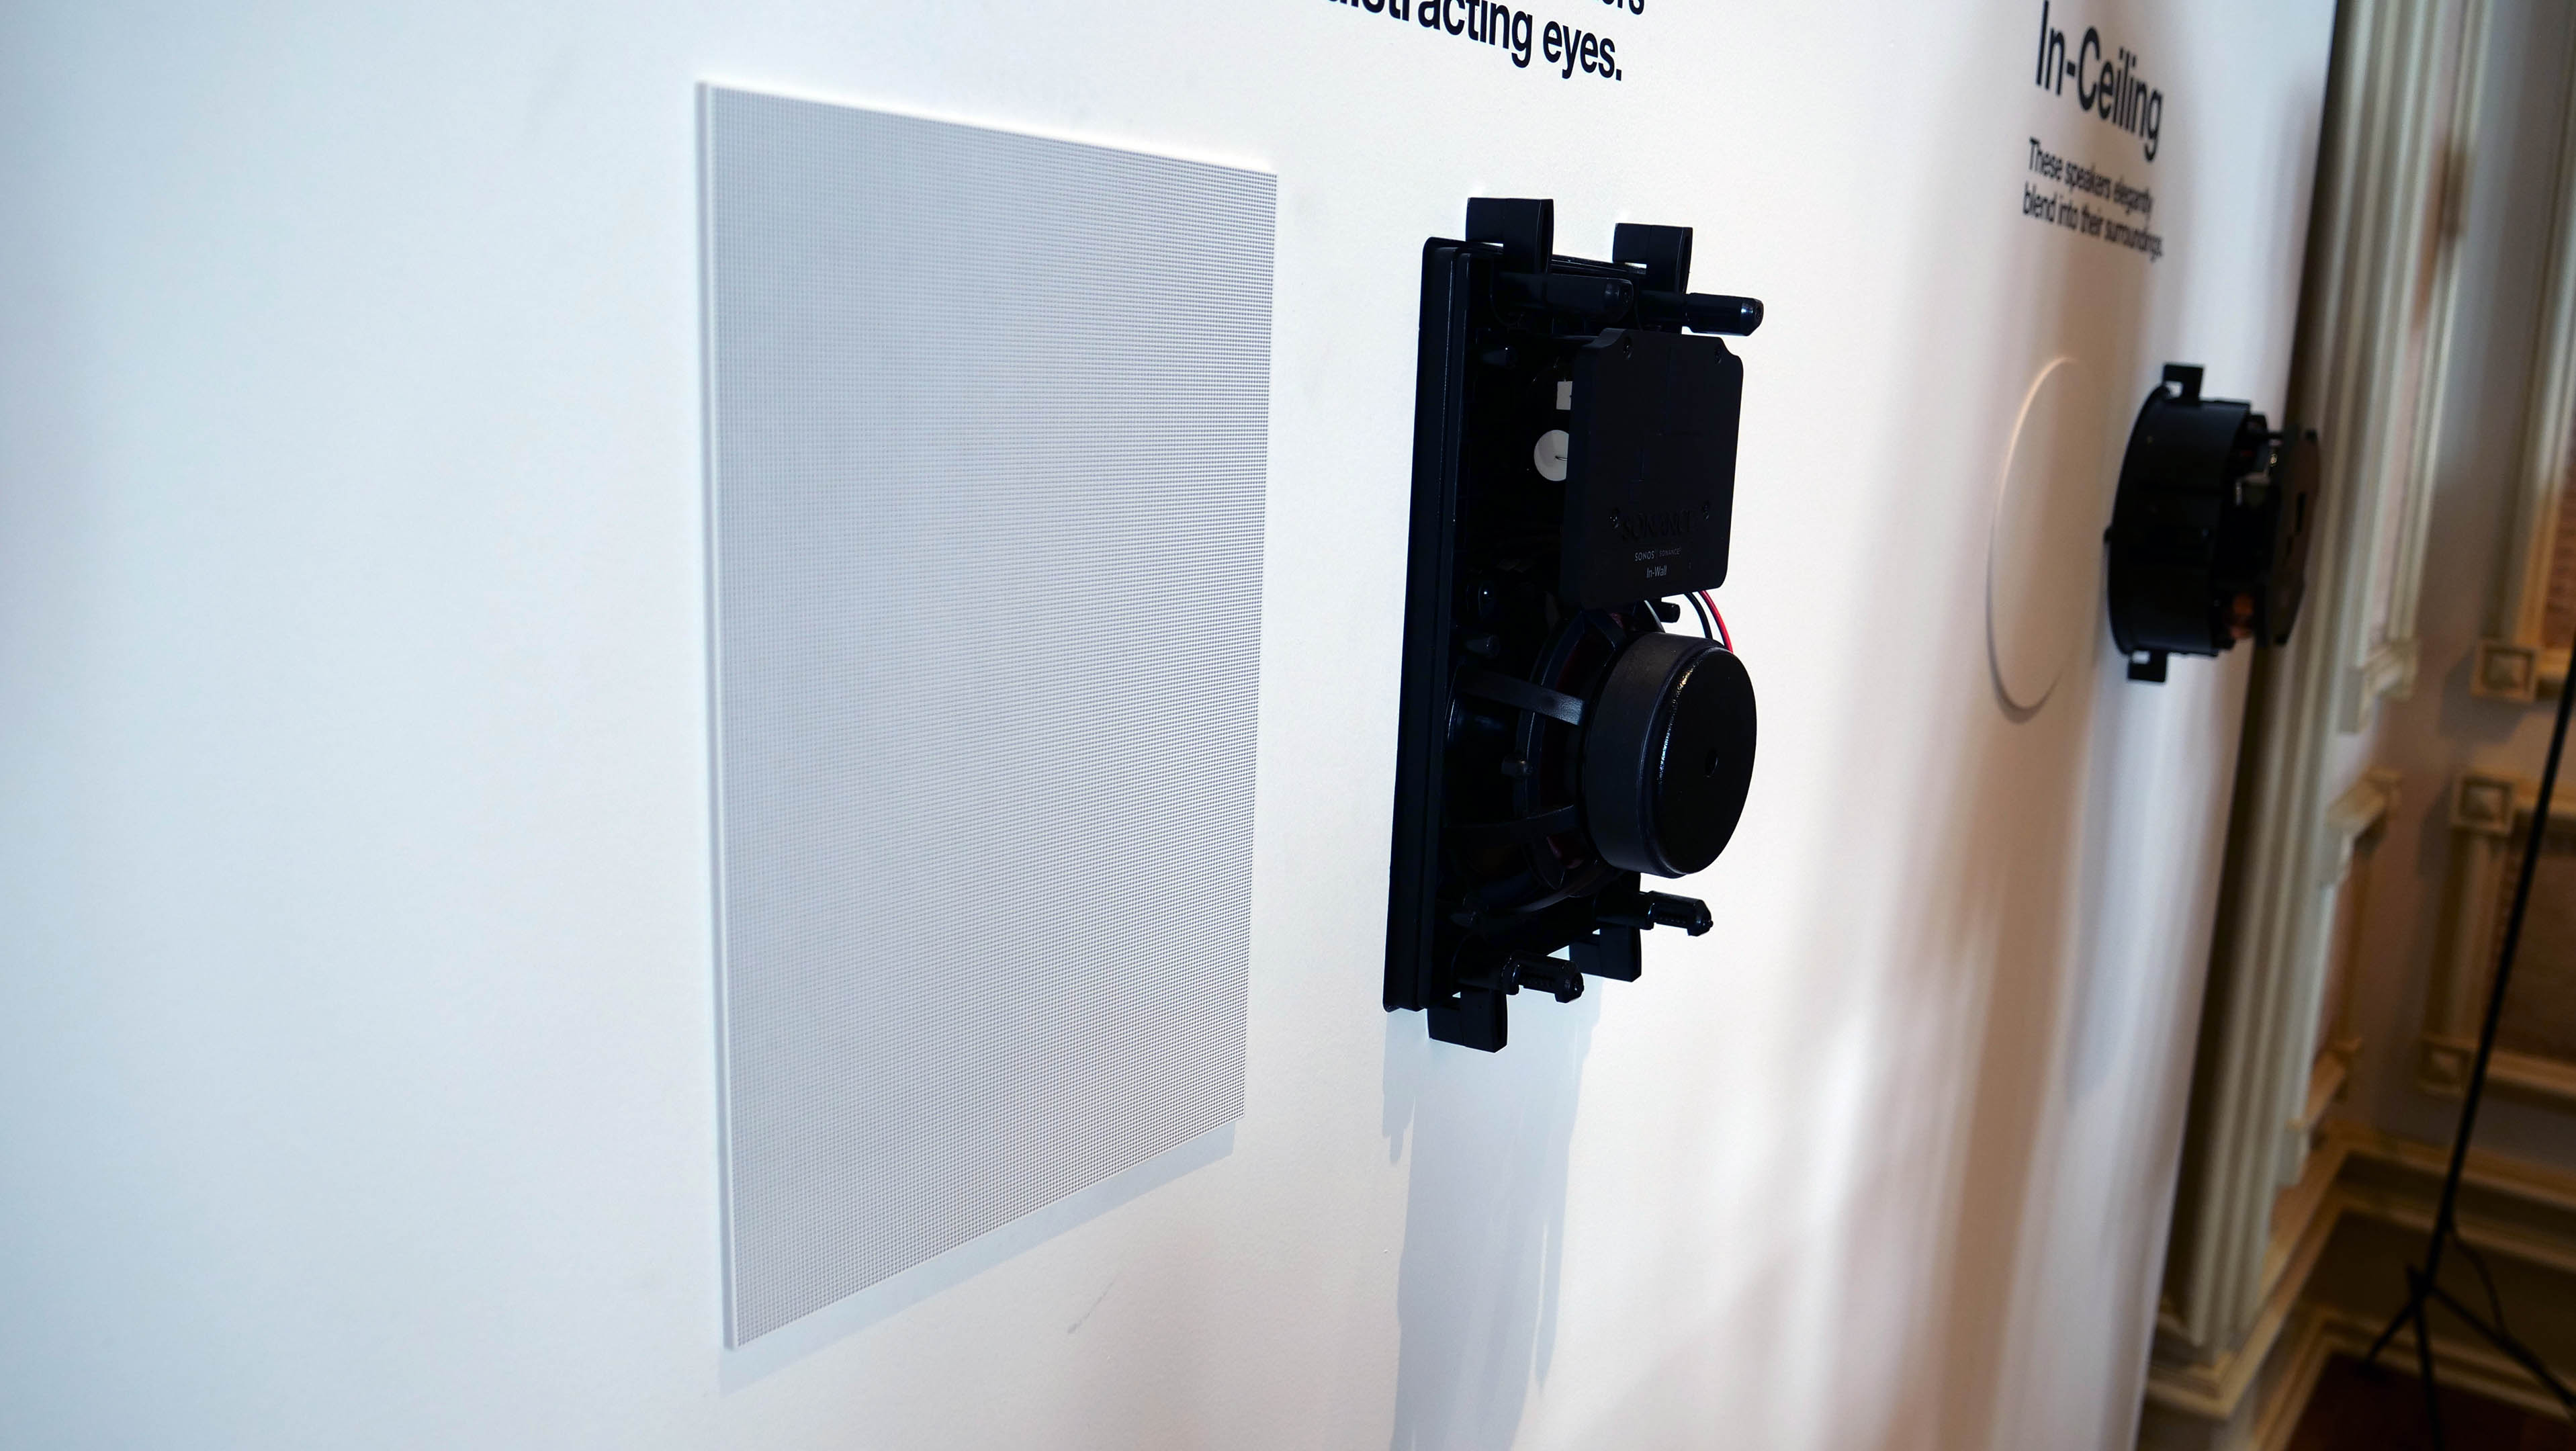 Sonance Sonos in-wall